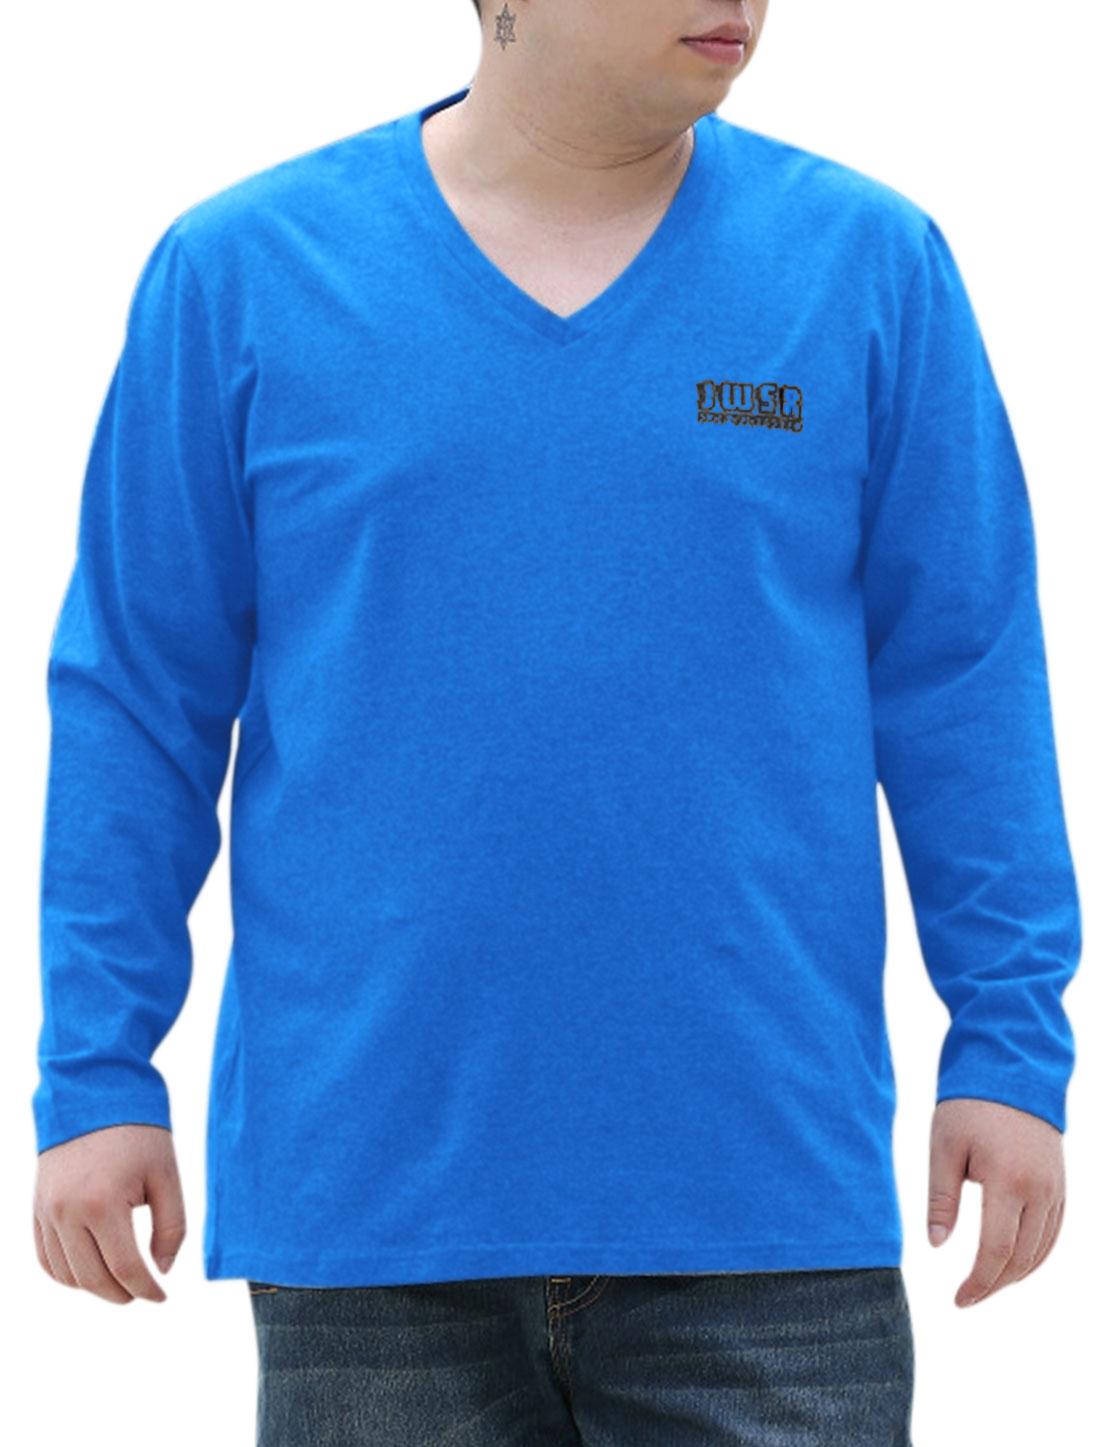 Men New Fashion V Neck Letters Print Big-Tall Casual T-shirt Navy Blue 2X Big